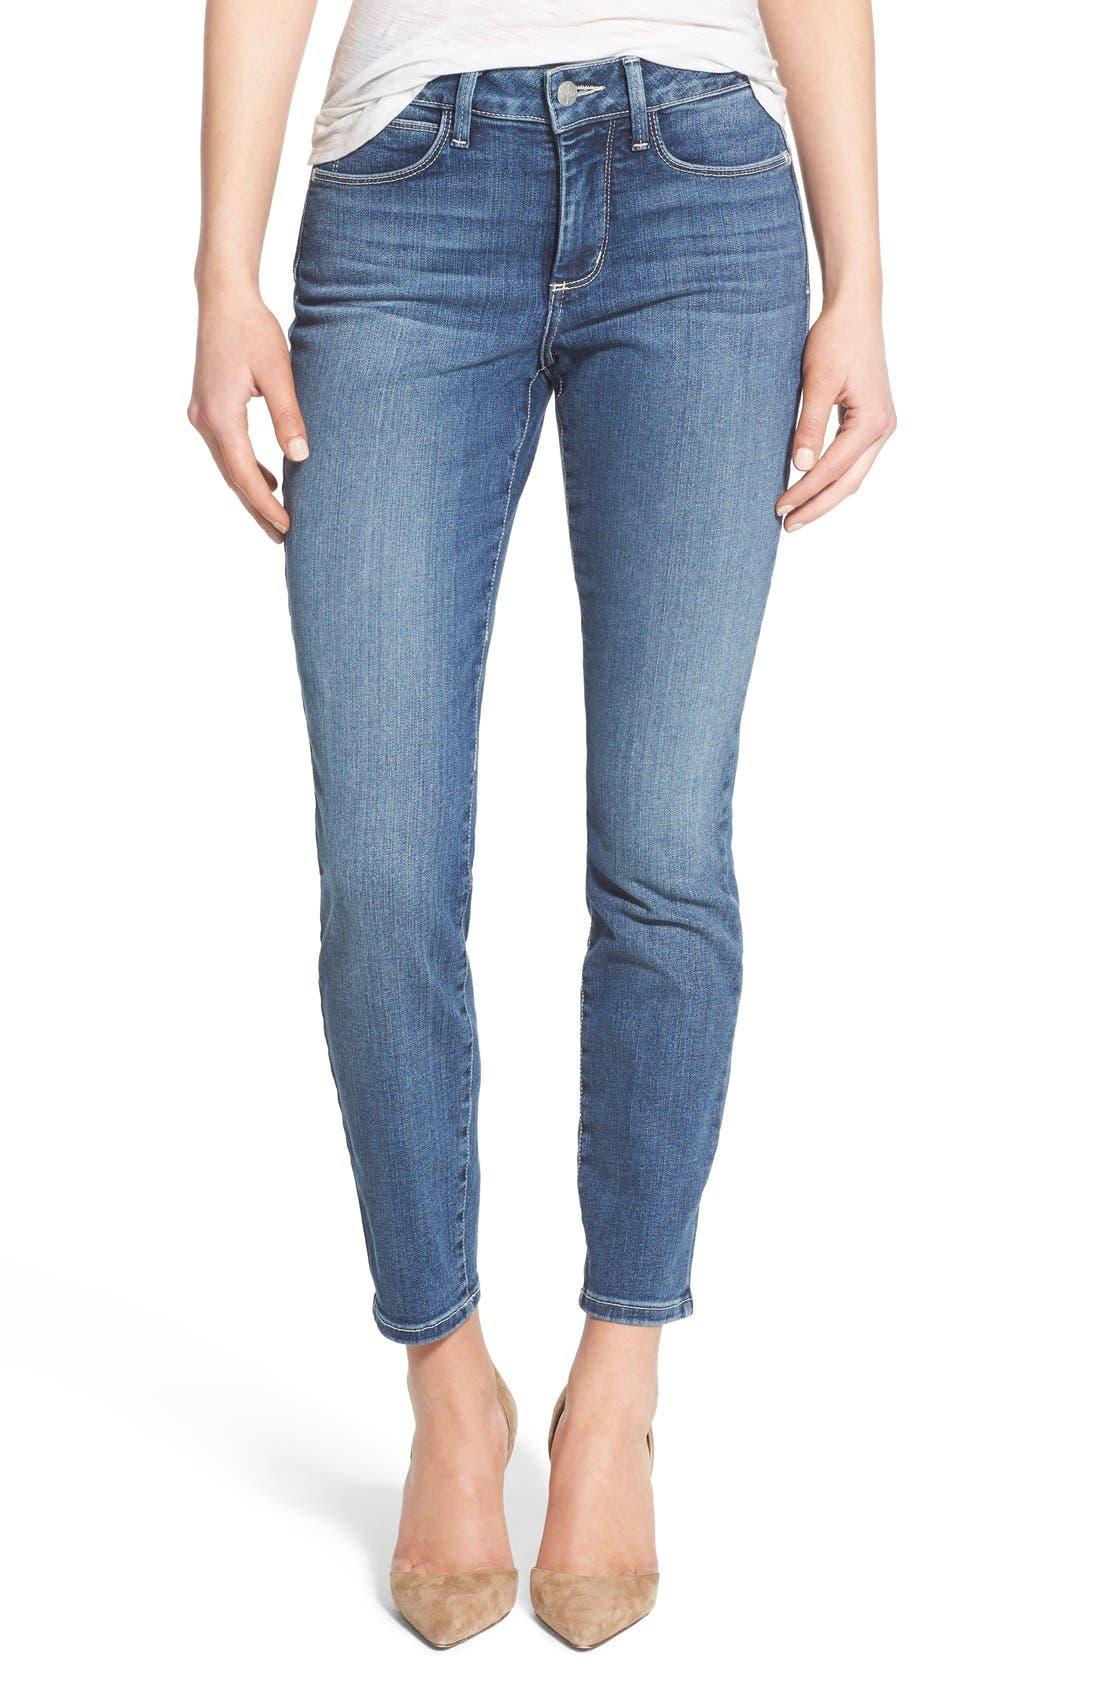 Main Image - NYDJ 'Clarissa' Stretch Ankle Skinny Jeans (Heyburn) (Regular & Petite)